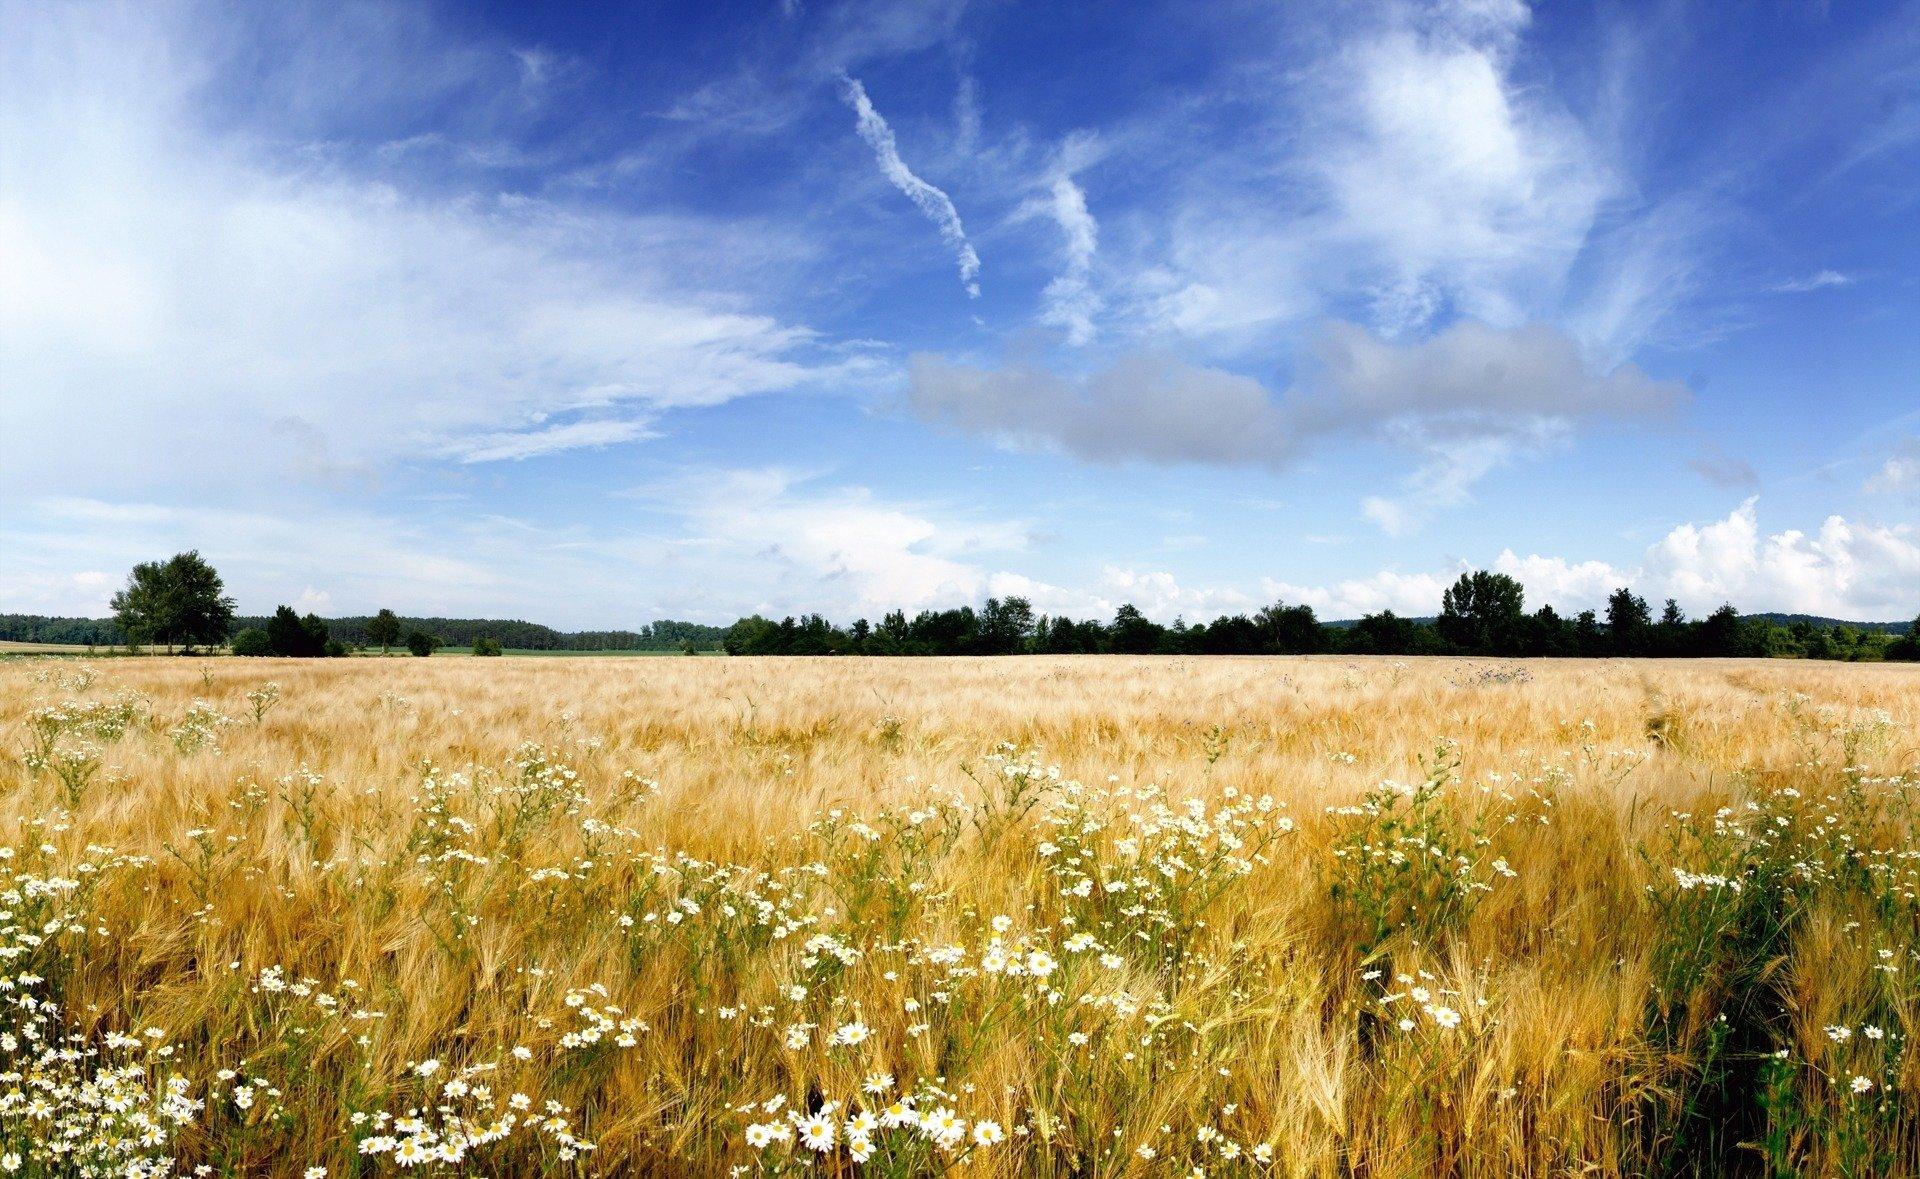 природа небо облака трава горизонт загрузить